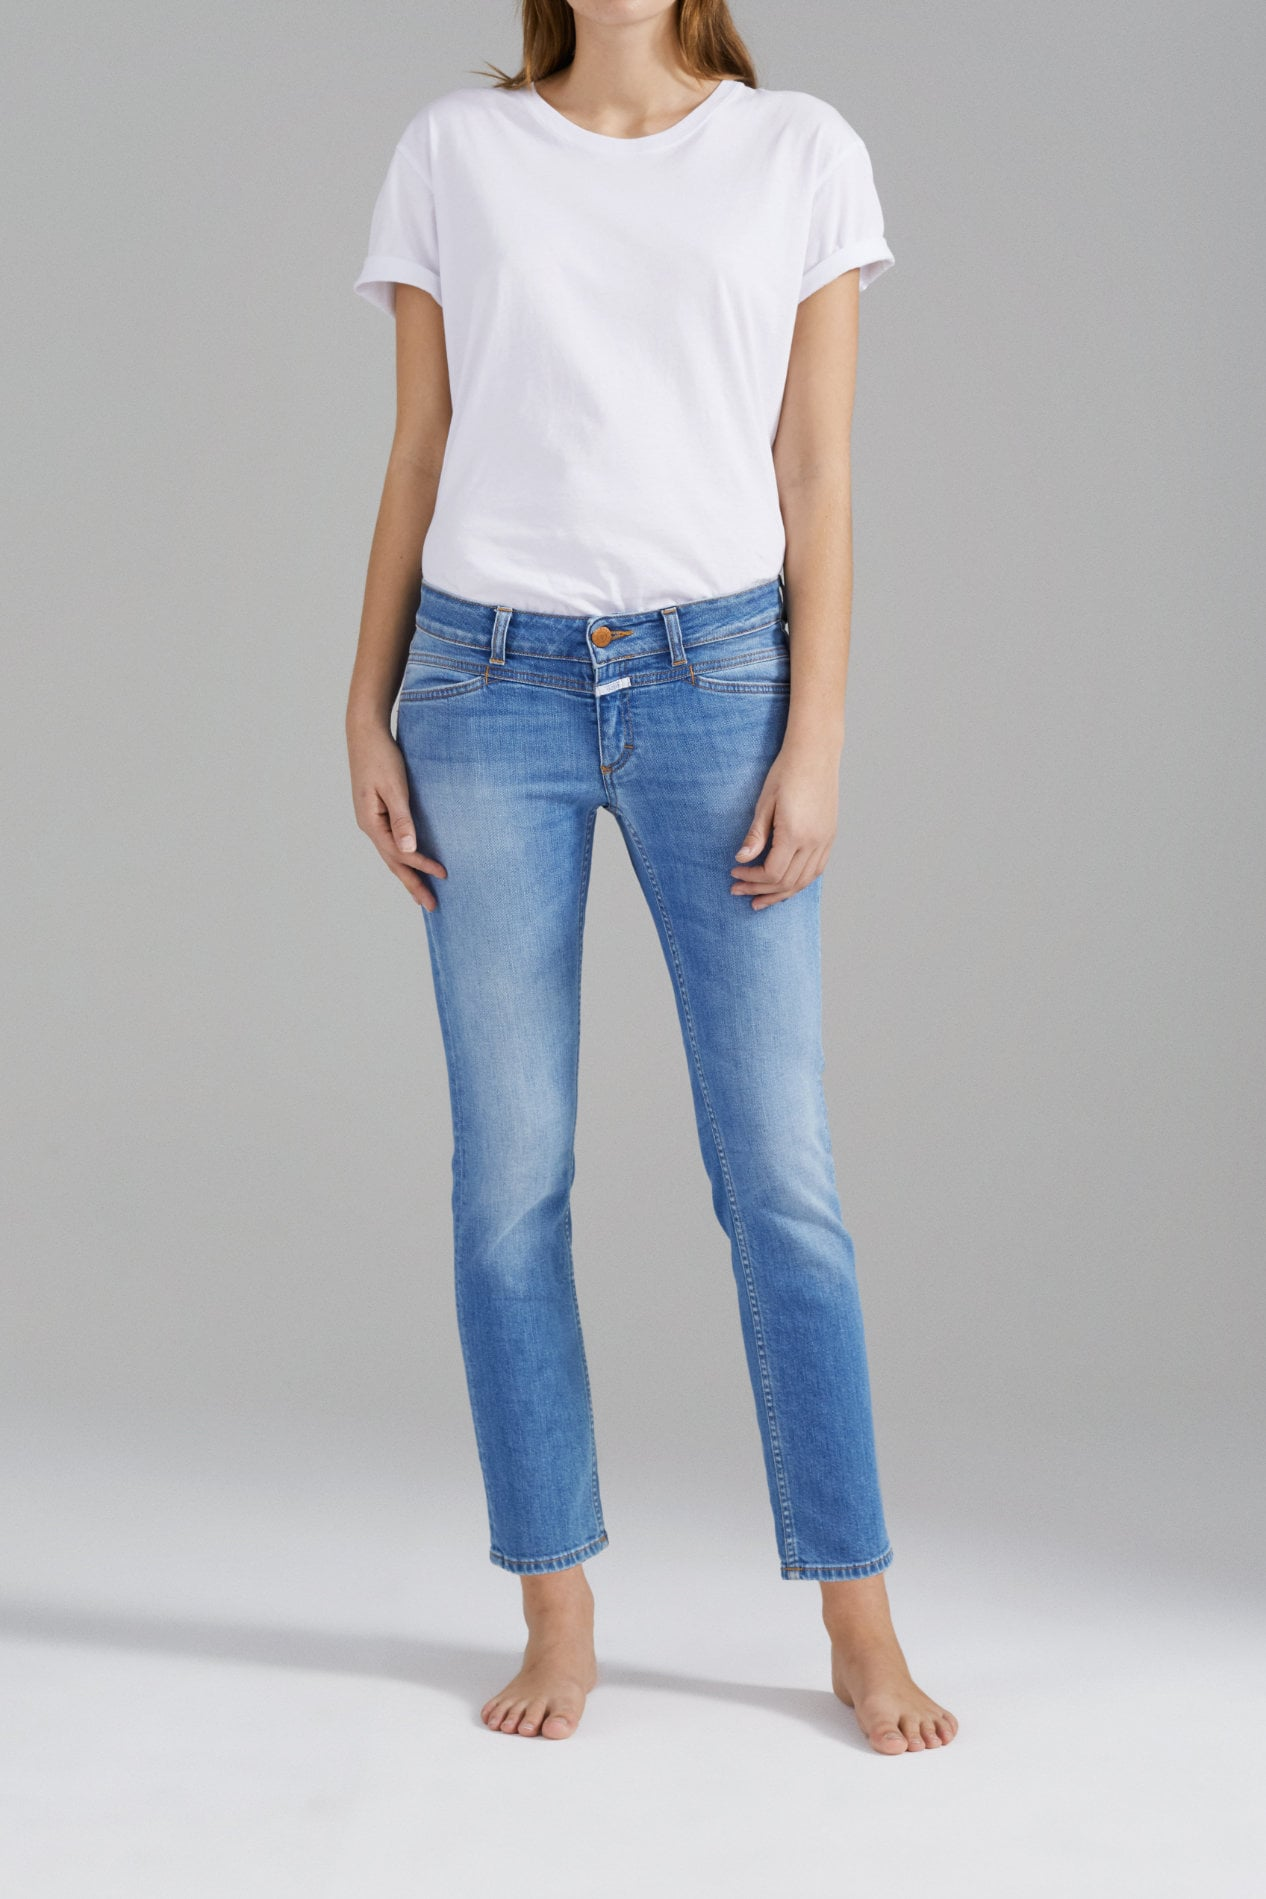 jeans hosen damen closed